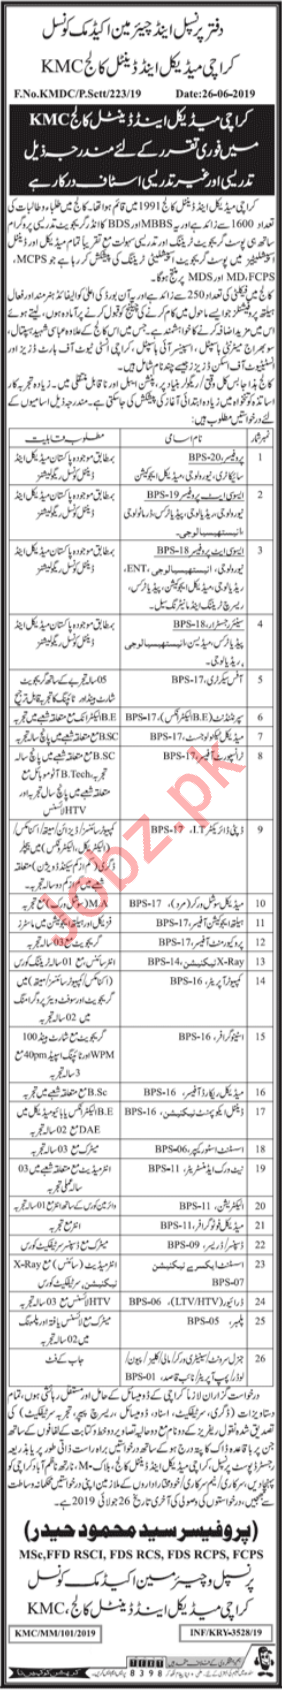 Karachi Medical & Dental College Jobs 2019 For Karachi